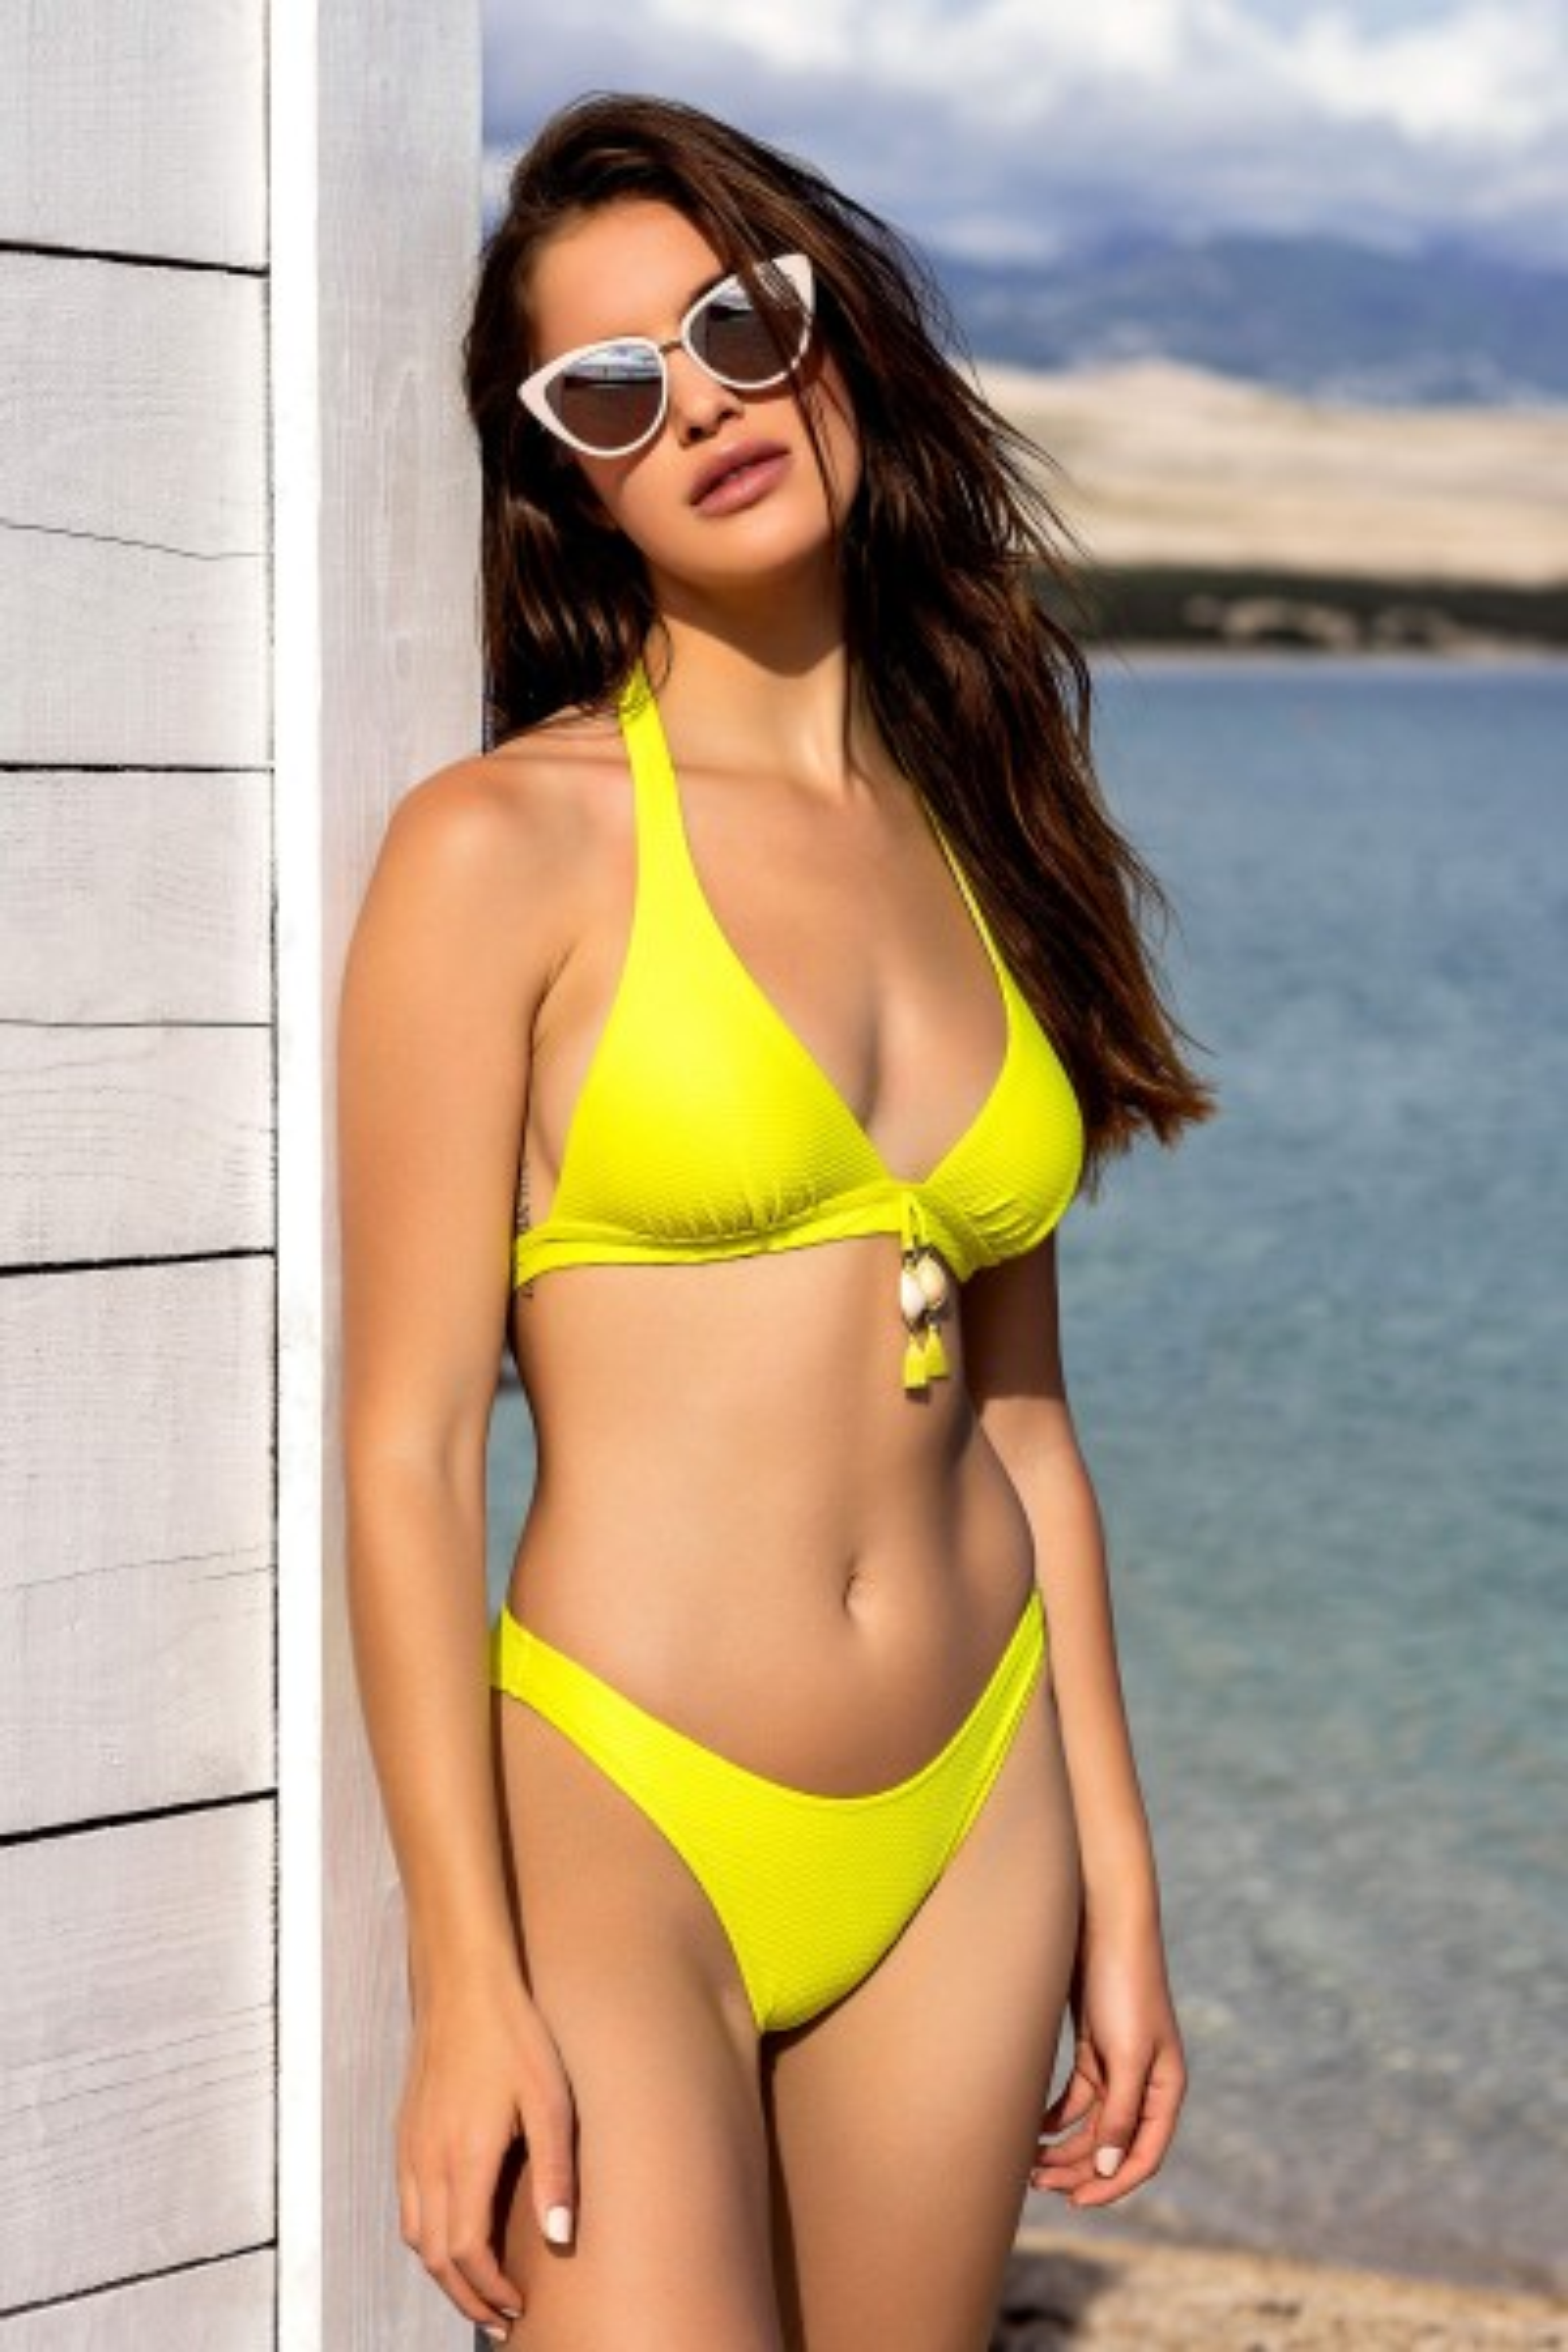 Триаголен градник без жица »Ibiza« - костим за капење